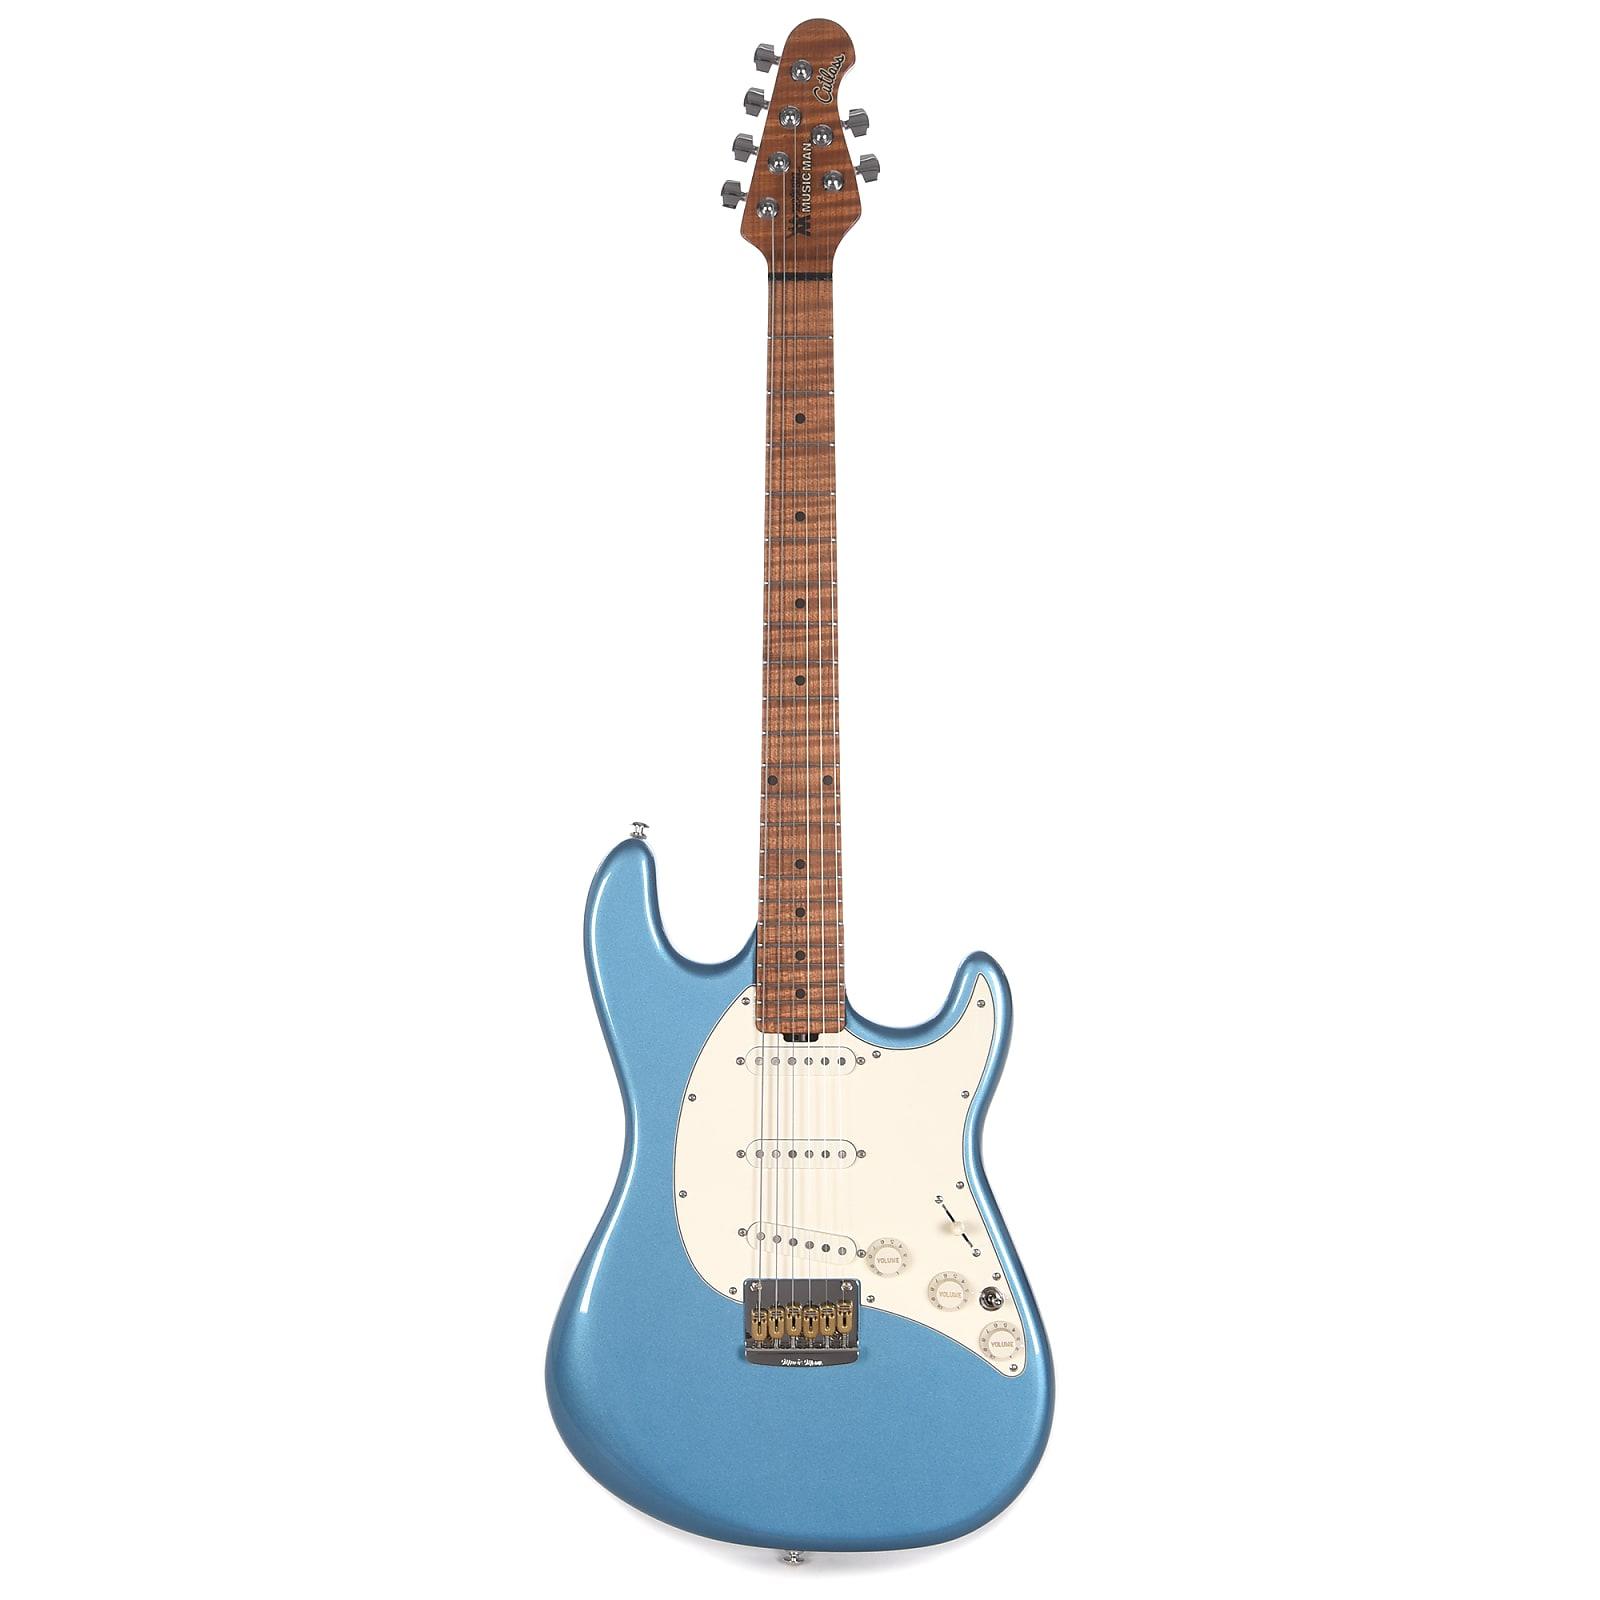 Music Man Signature Hunter Hayes Cutlass Guitar Lake Tahoe Blue w/Roasted Figured Maple Neck